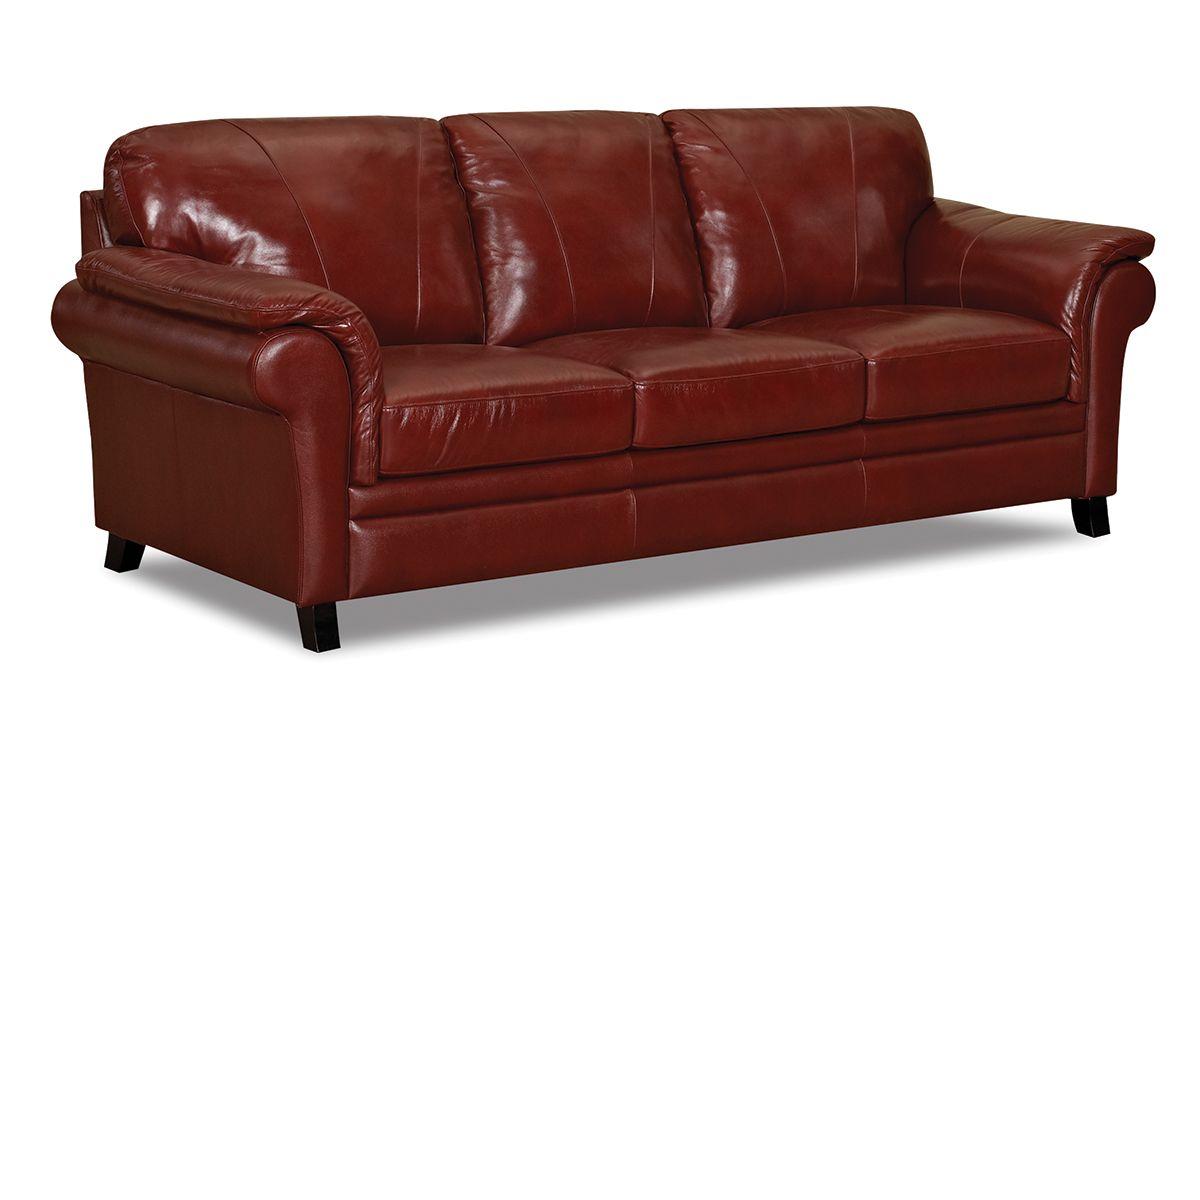 Sectional Sofas The Dump: The Dump Furniture - GRENADINE SOFA